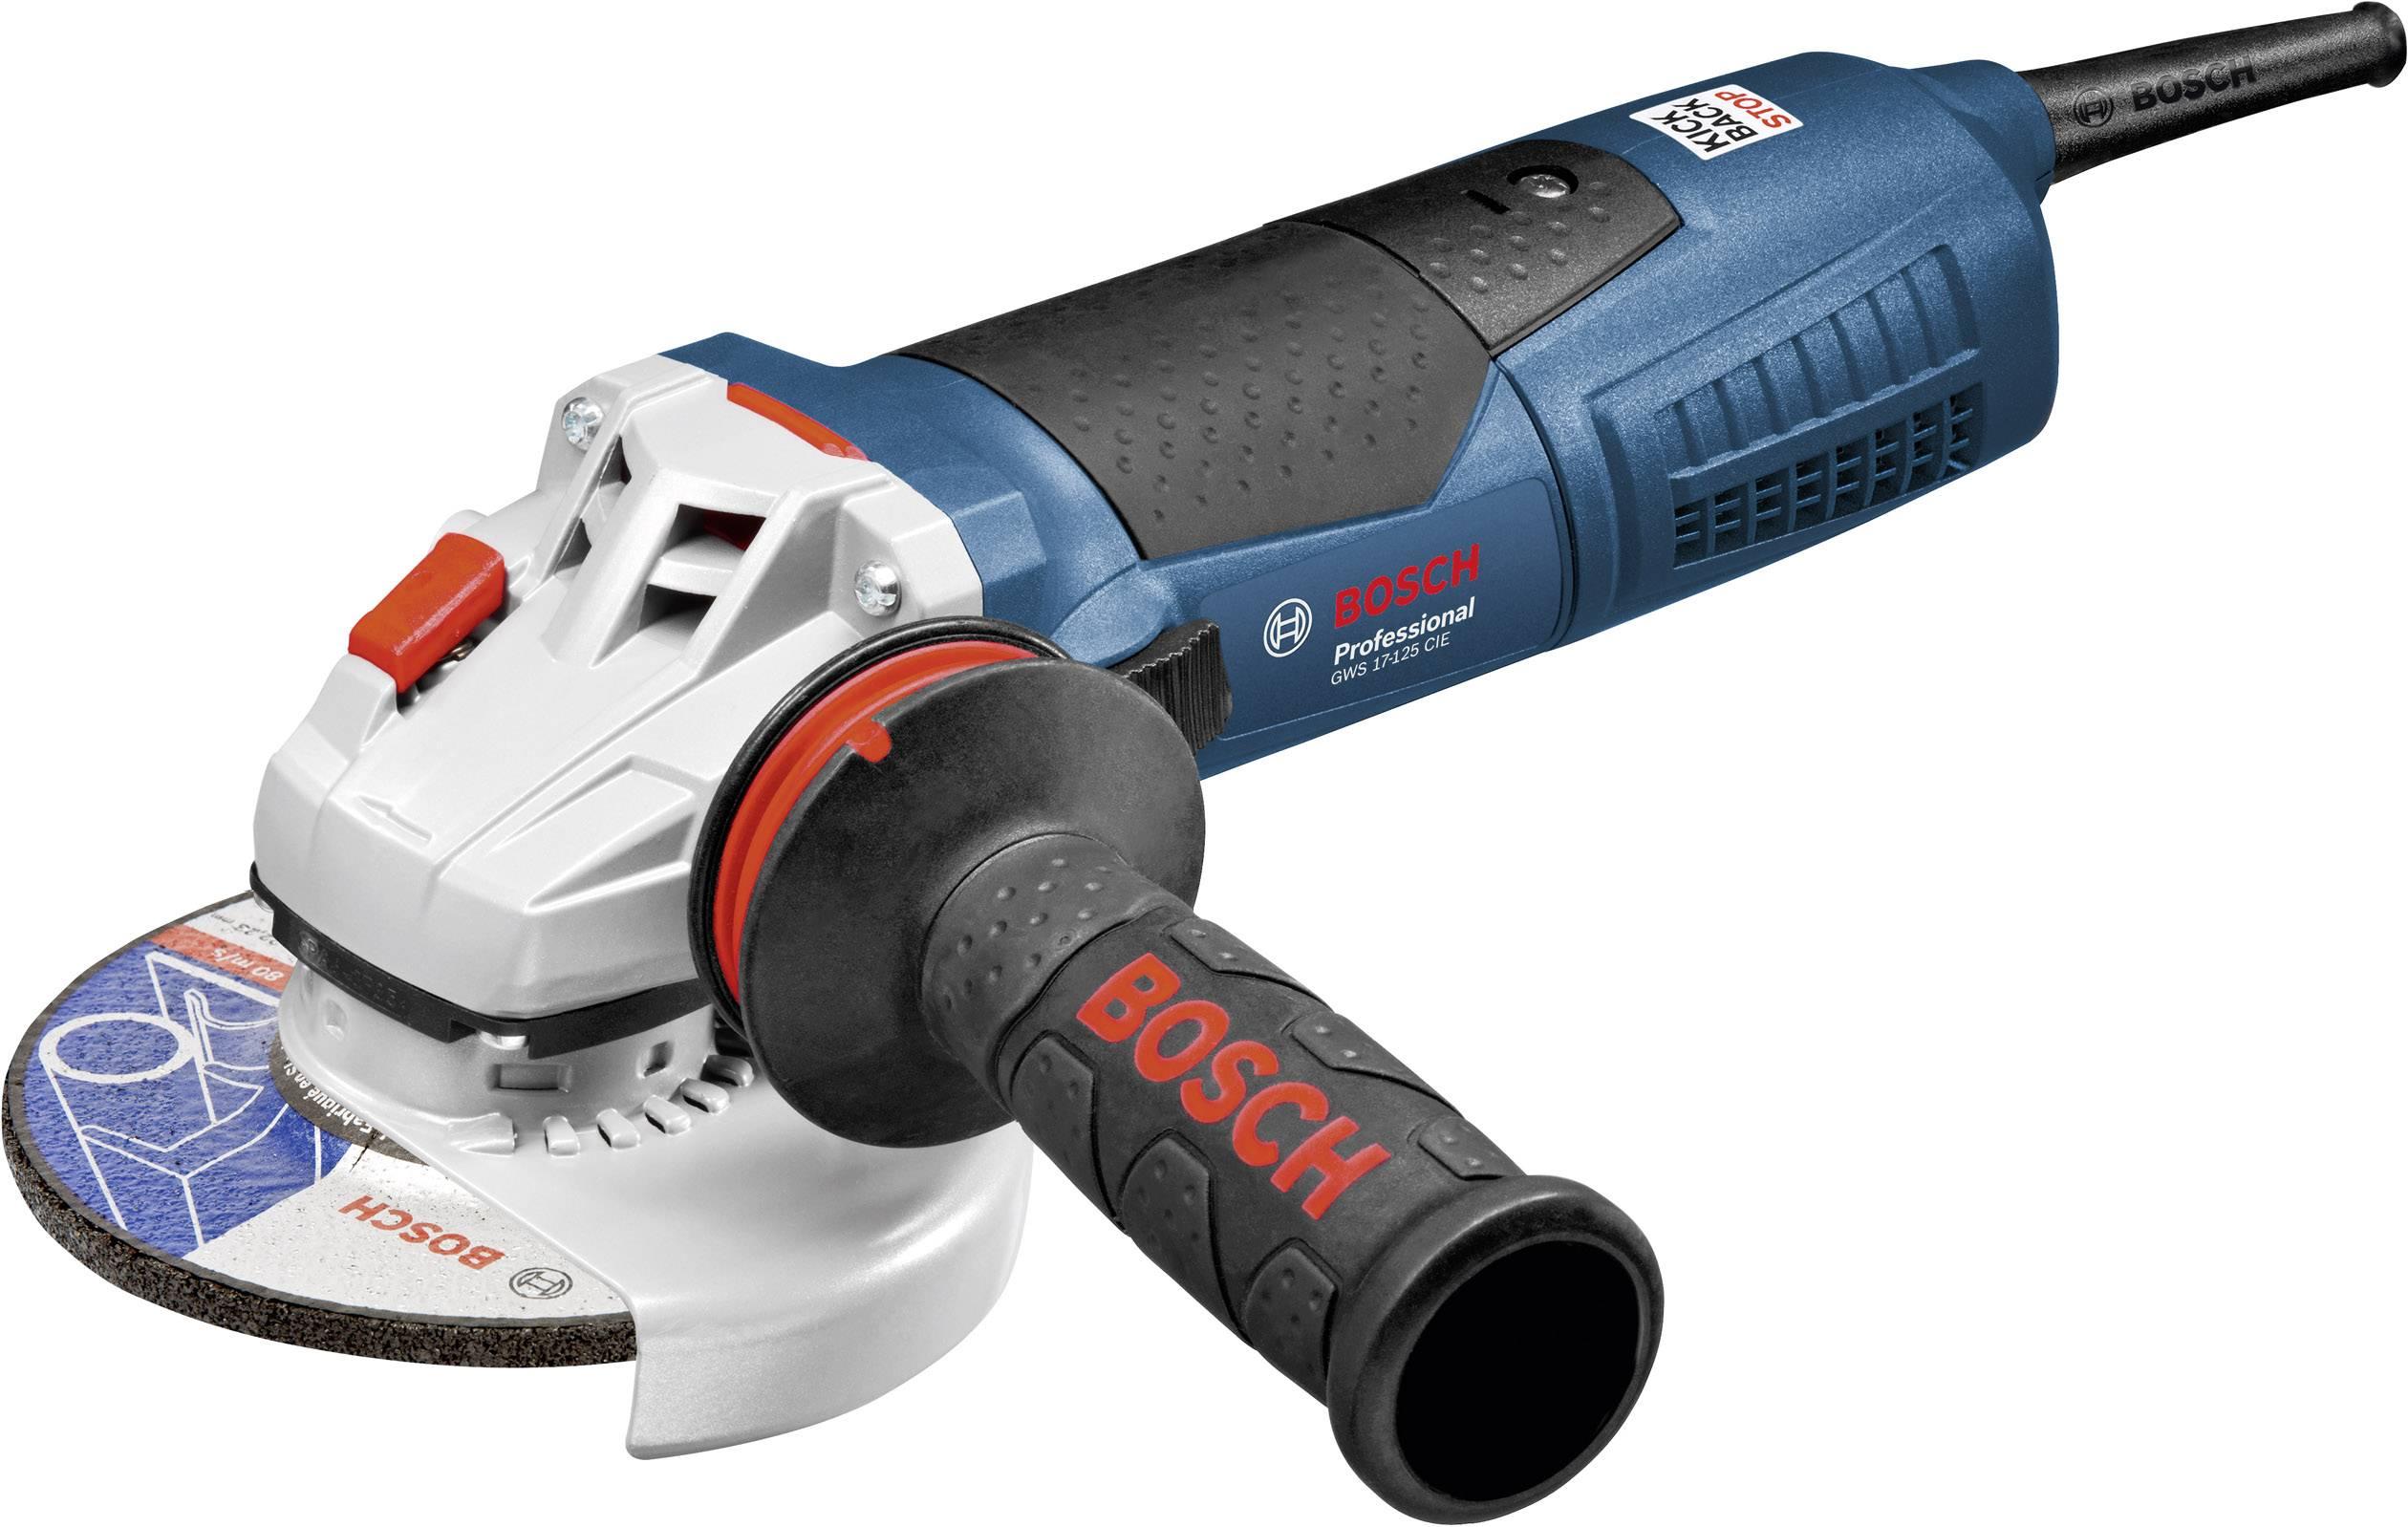 Uhlová brúska Bosch Professional GWS 17-125 CIE 060179H003, 125 mm, + púzdro, 1700 W